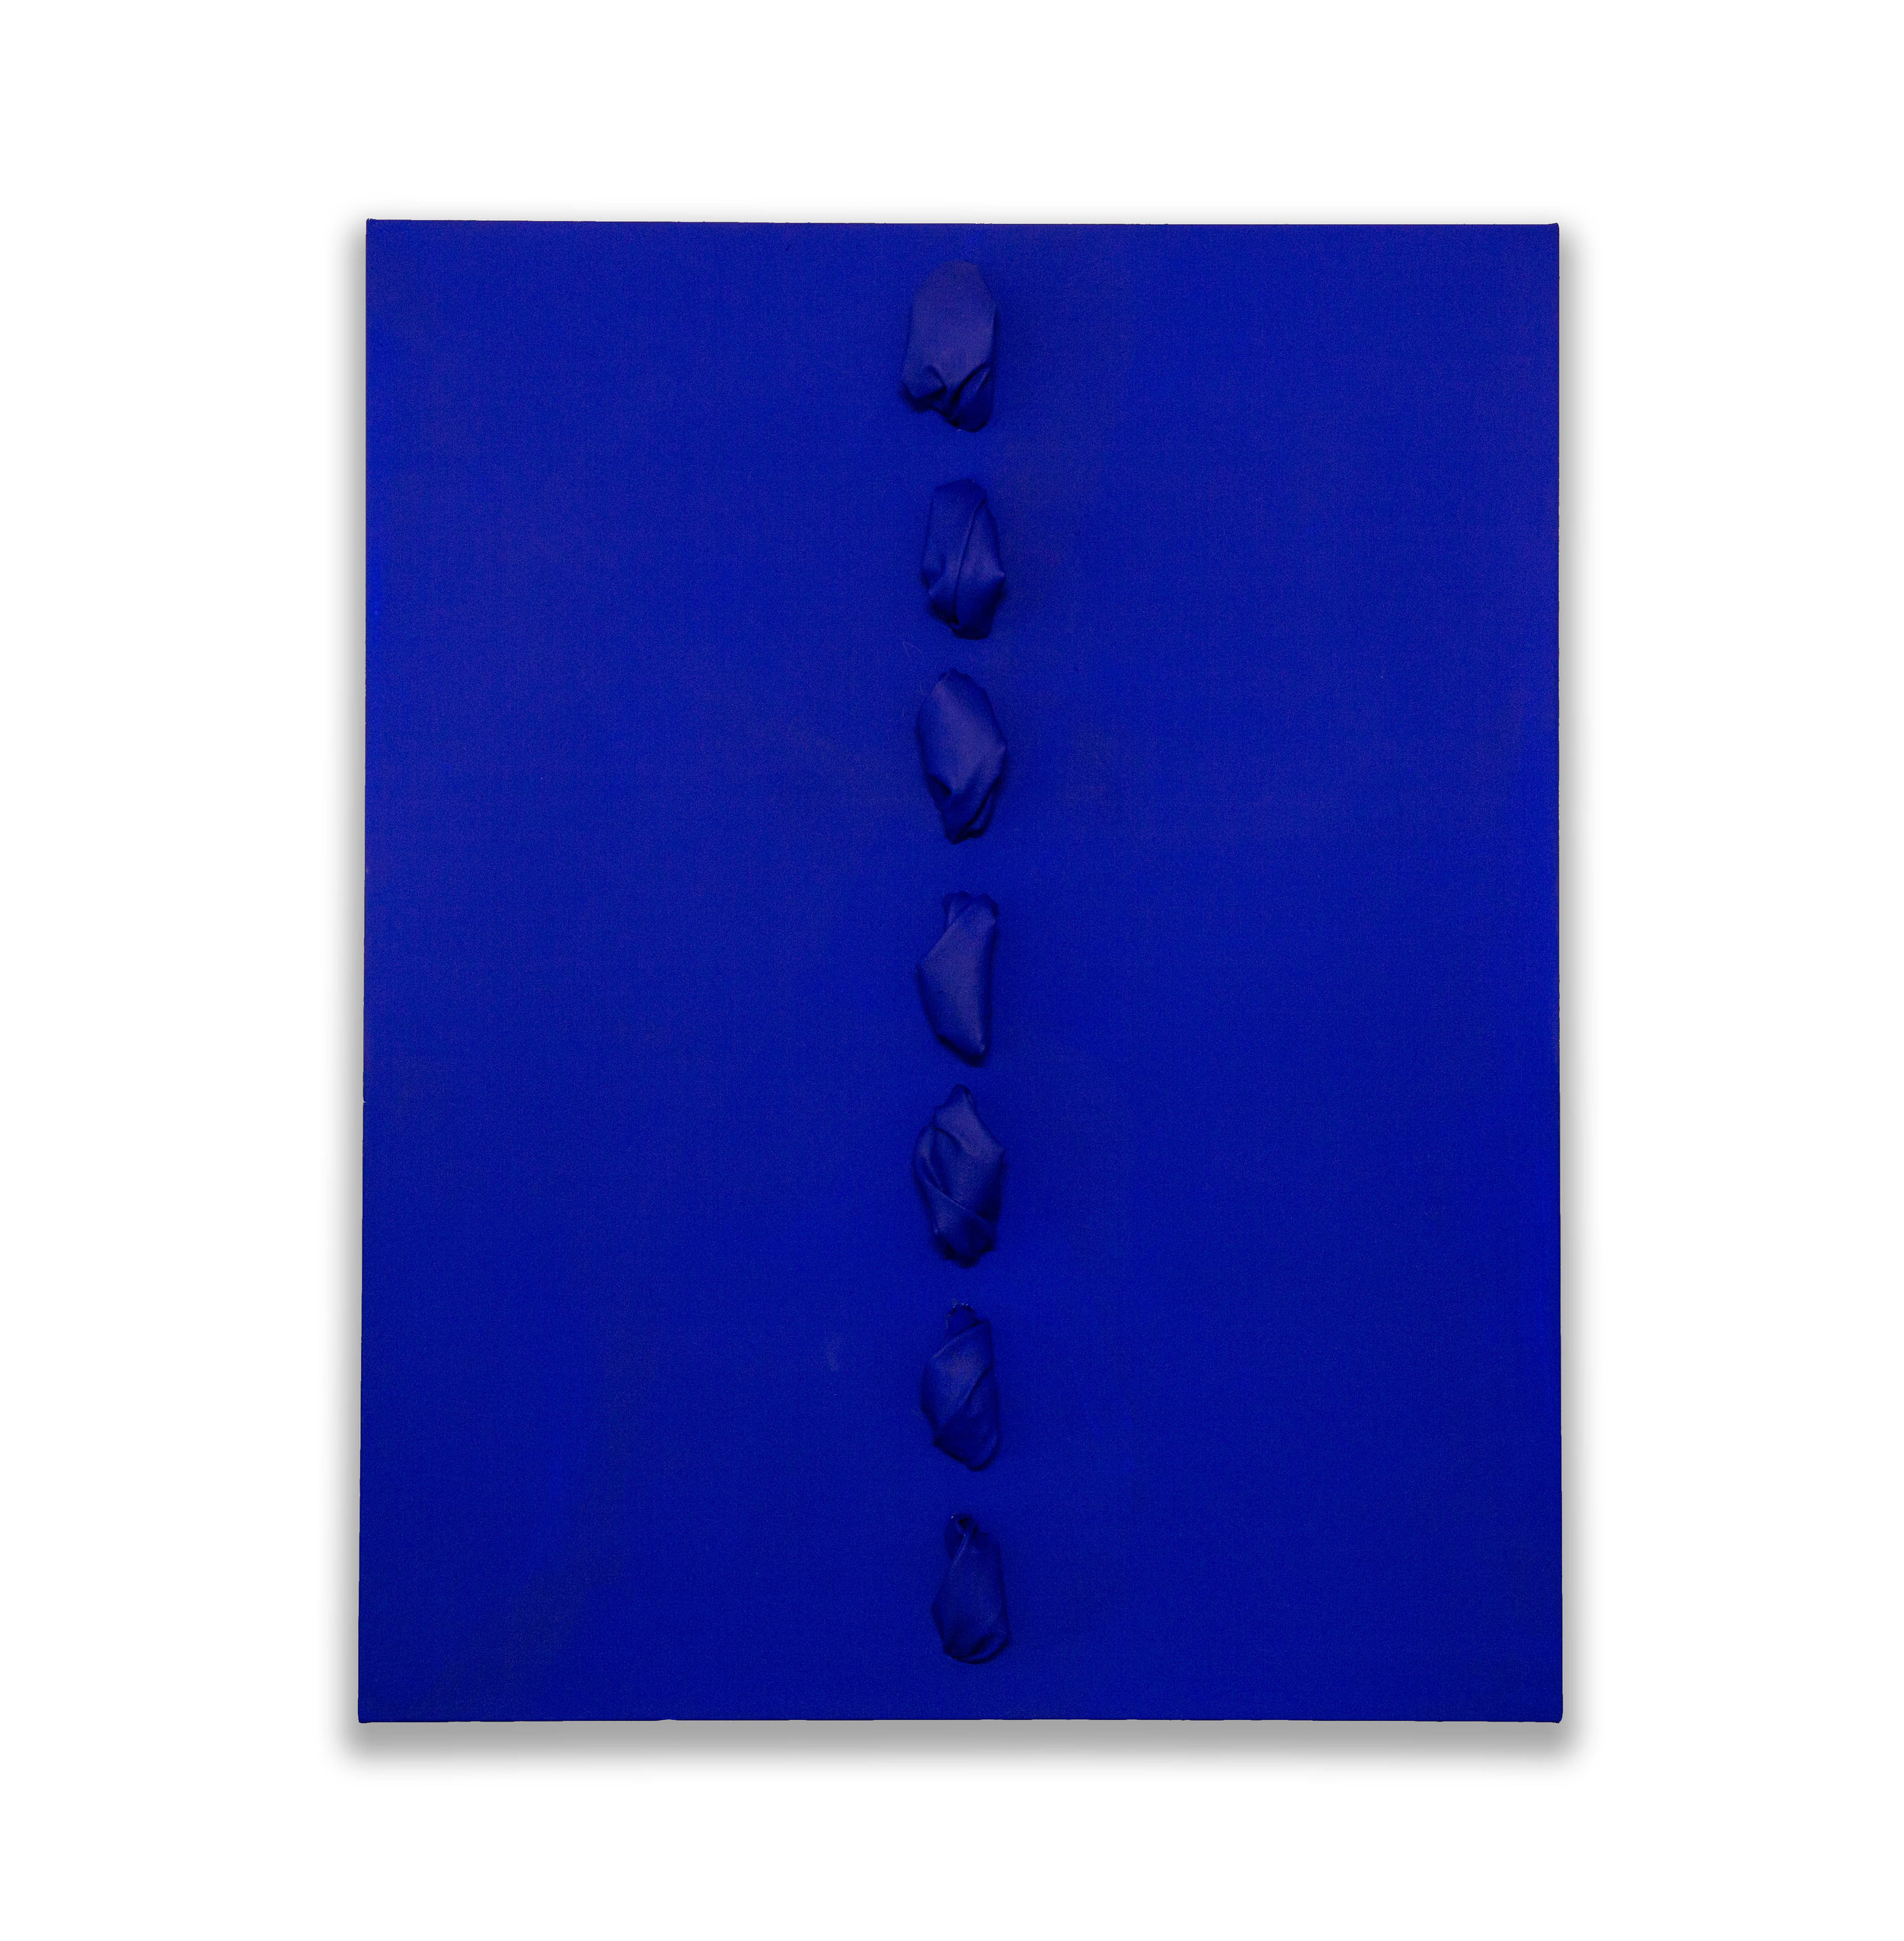 Cobalt Flow  - 2018  Pigmento acrilico su tela stesa su tavola  100 x 80 x 16 cm